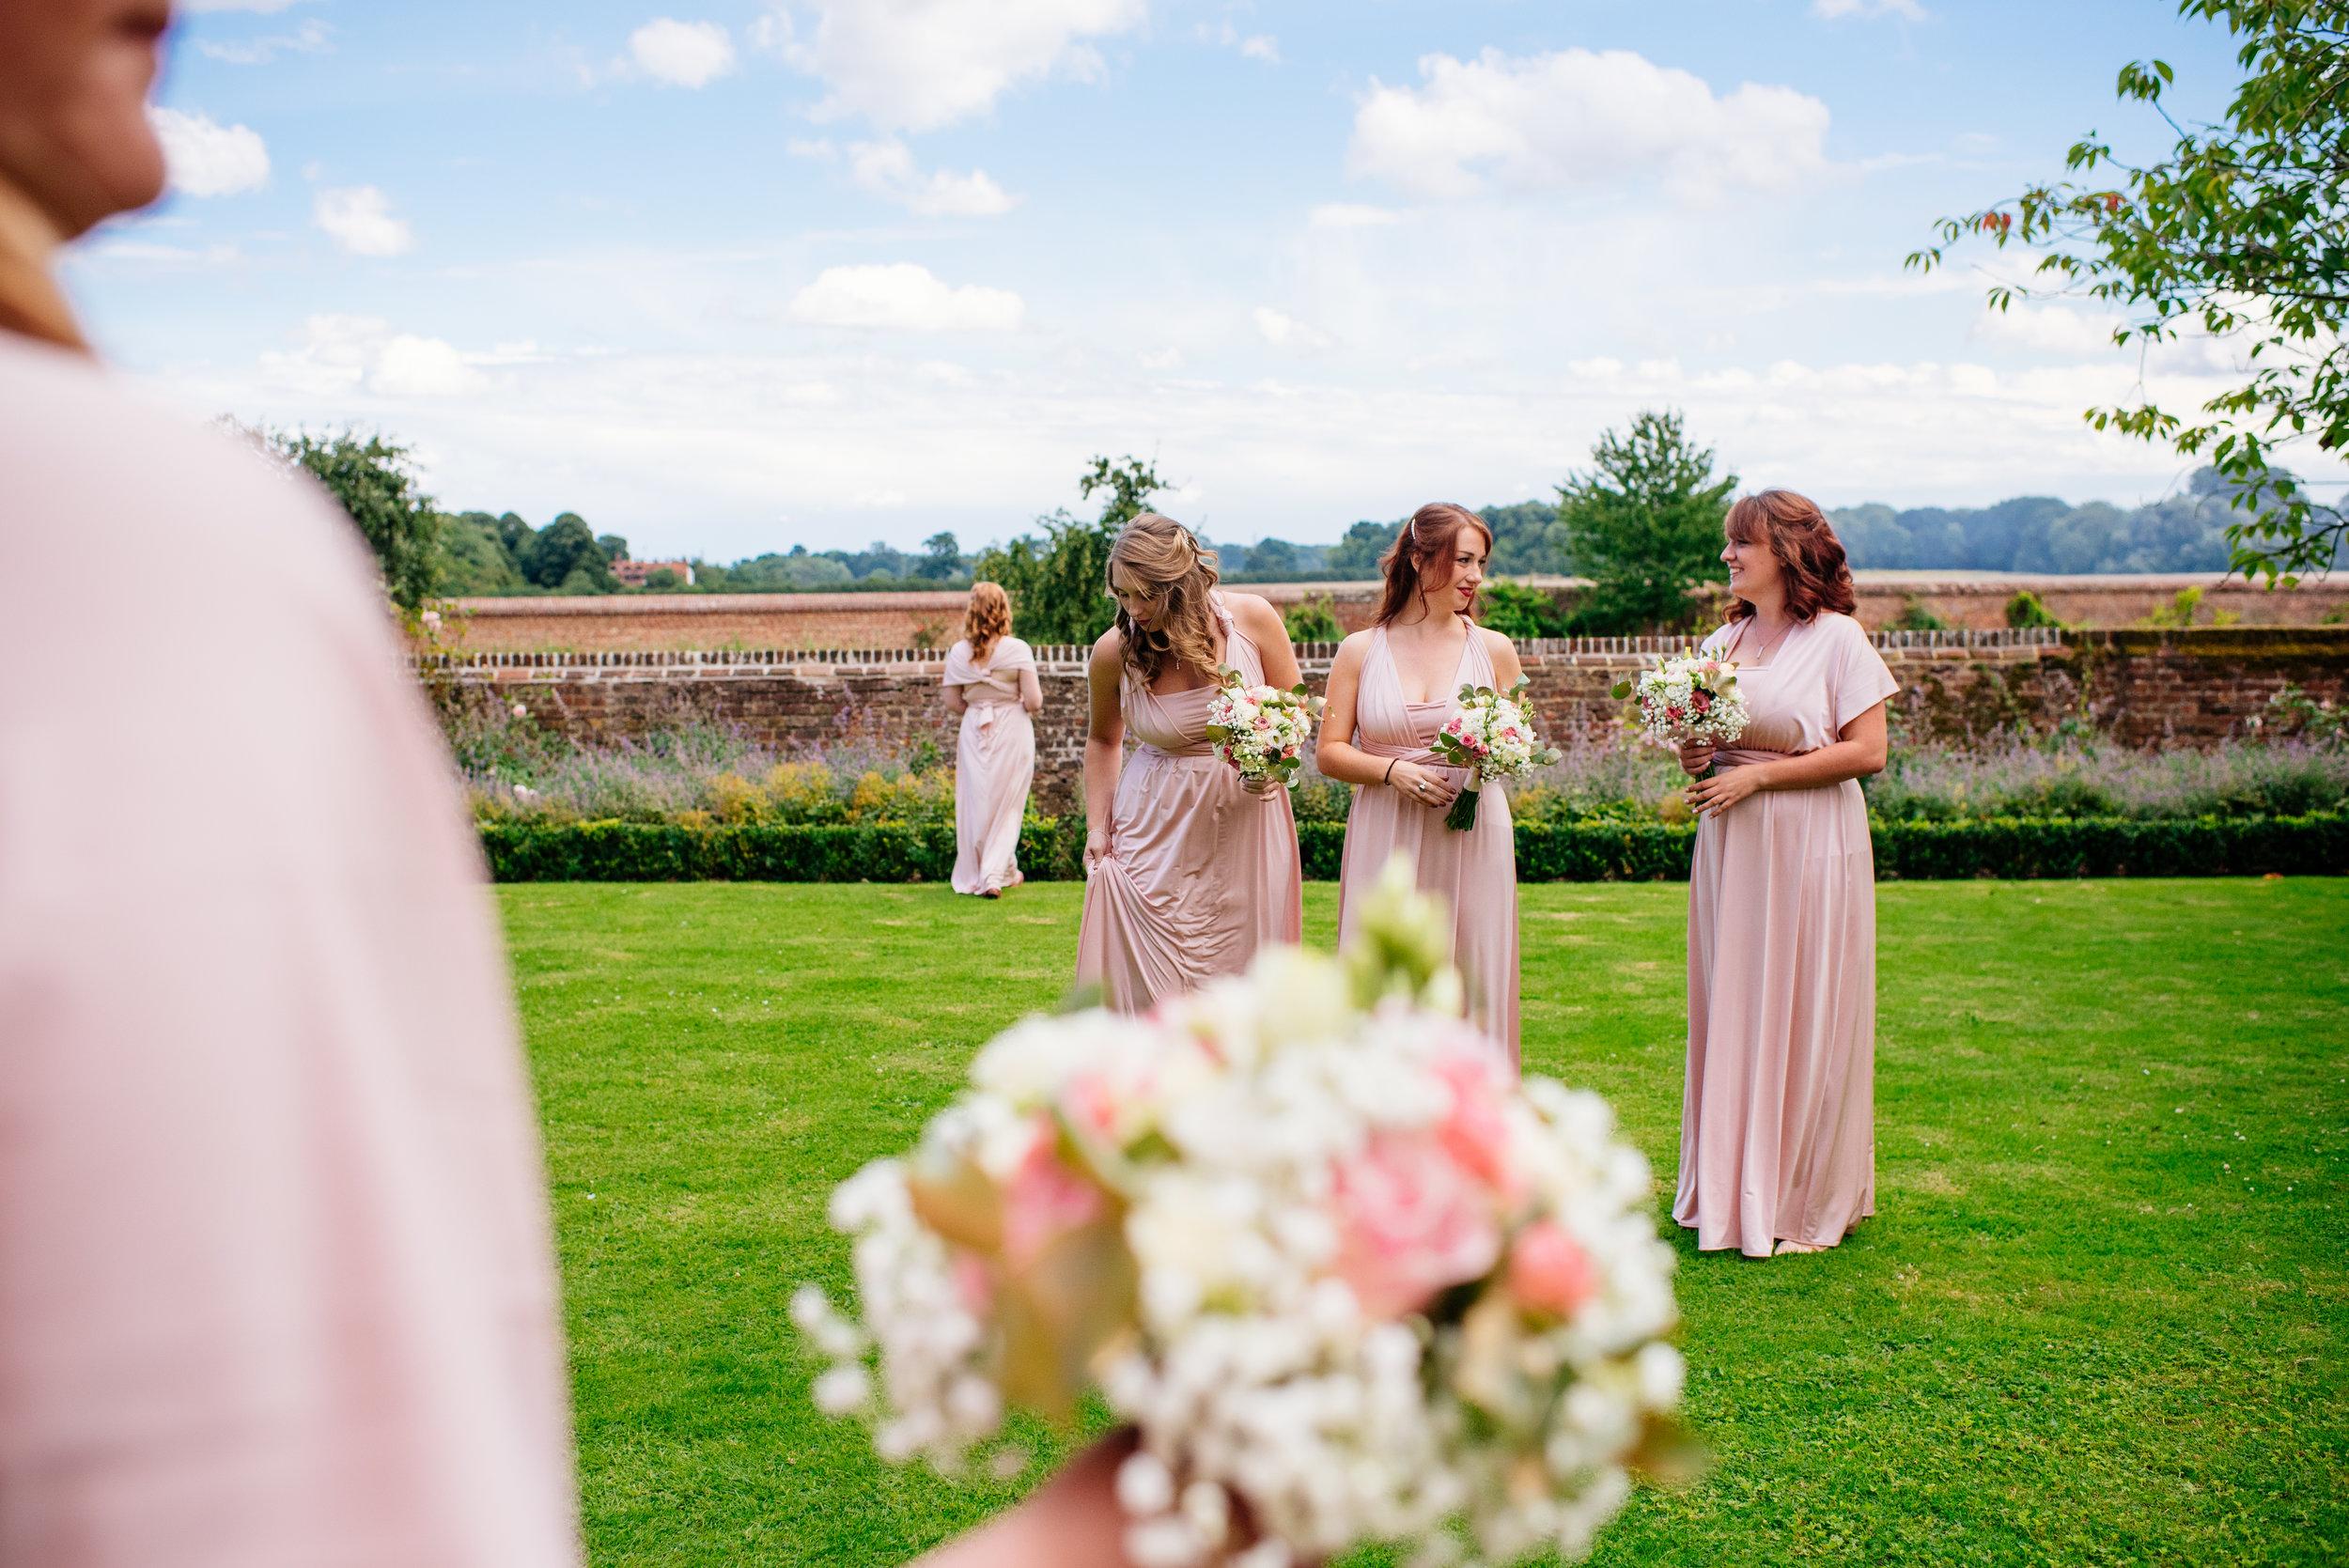 14 Lillibrooke Manor Berkshire Bridesmaids Landscape Wedding Photography.jpg